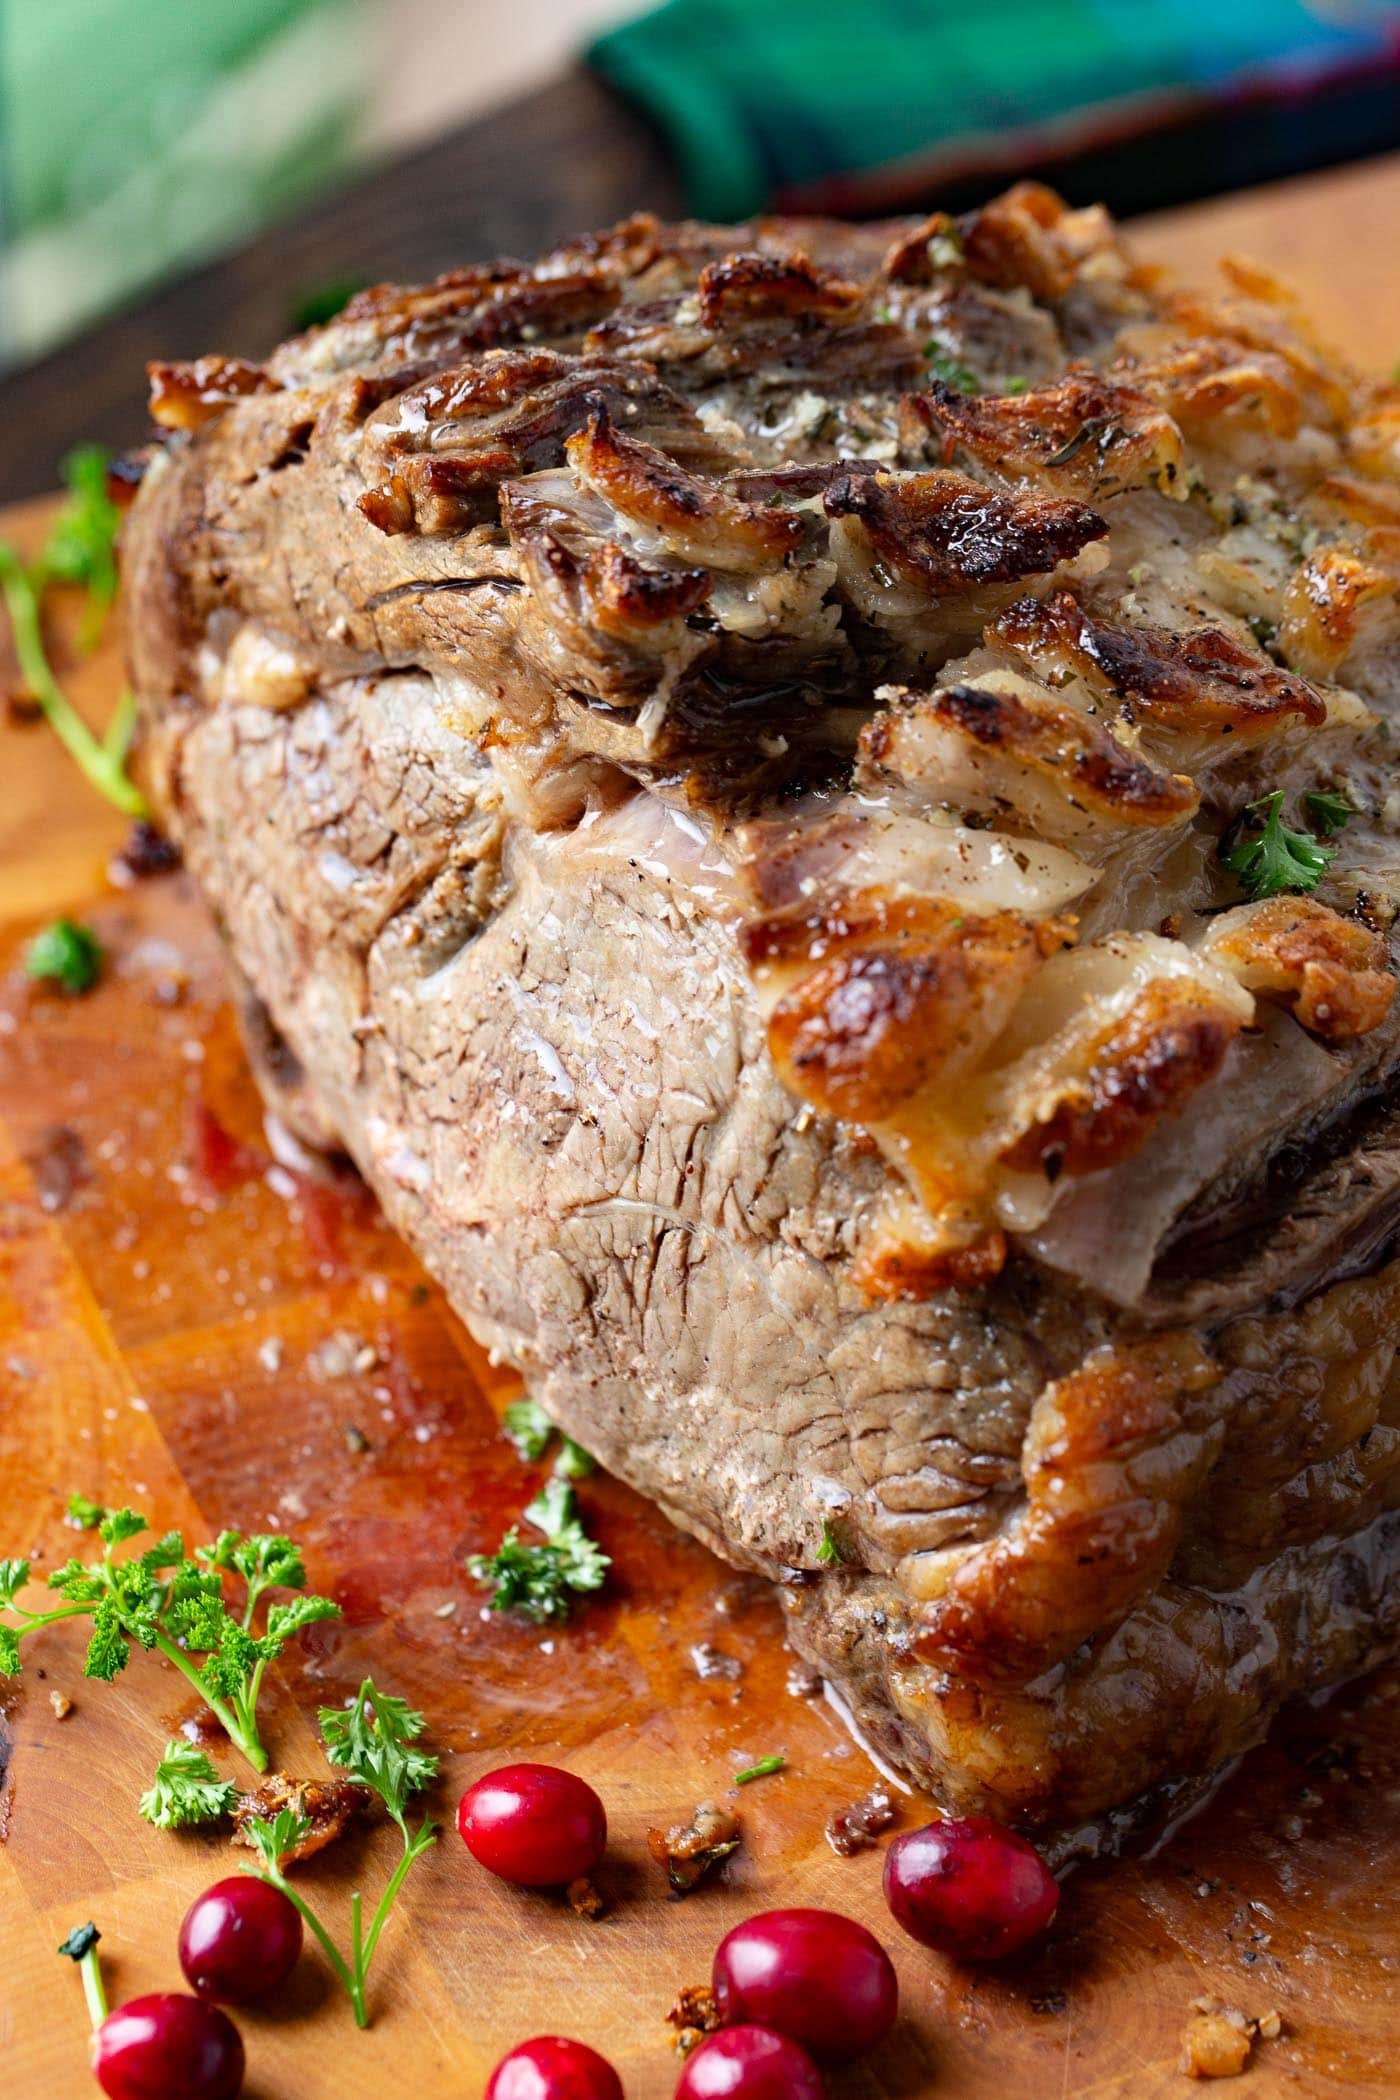 A photo a prime rib roast resting on a cutting board.